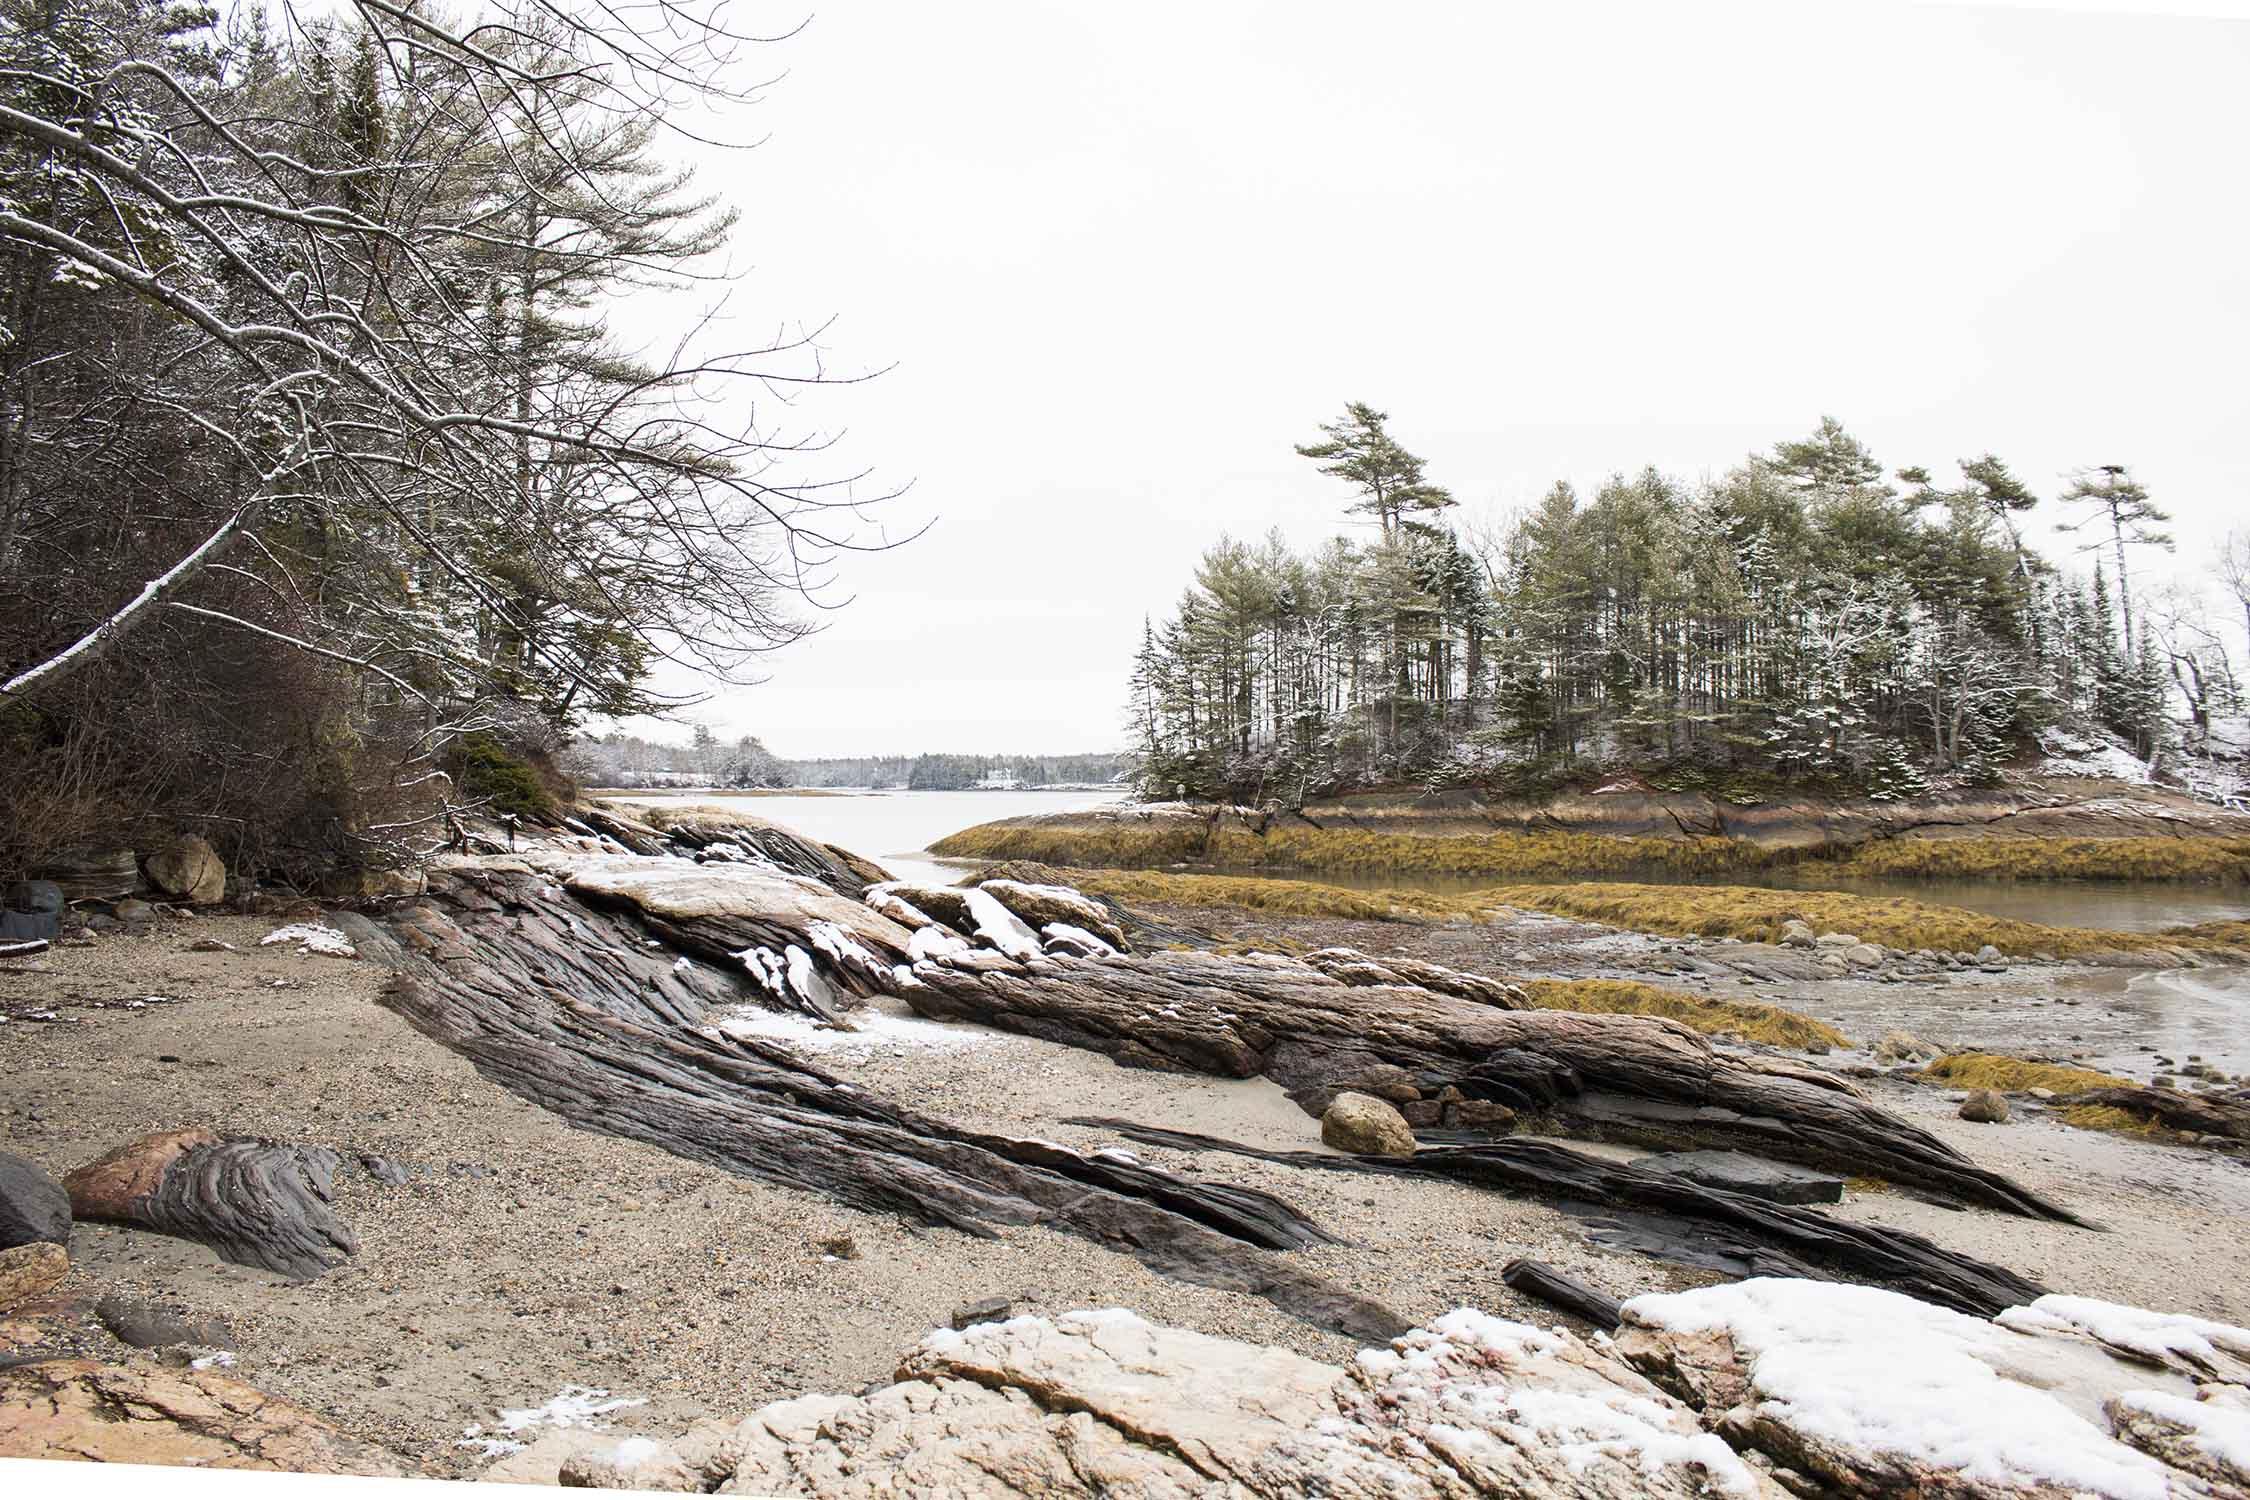 A Snowy December Weekend In Maine | Sea of Atlas